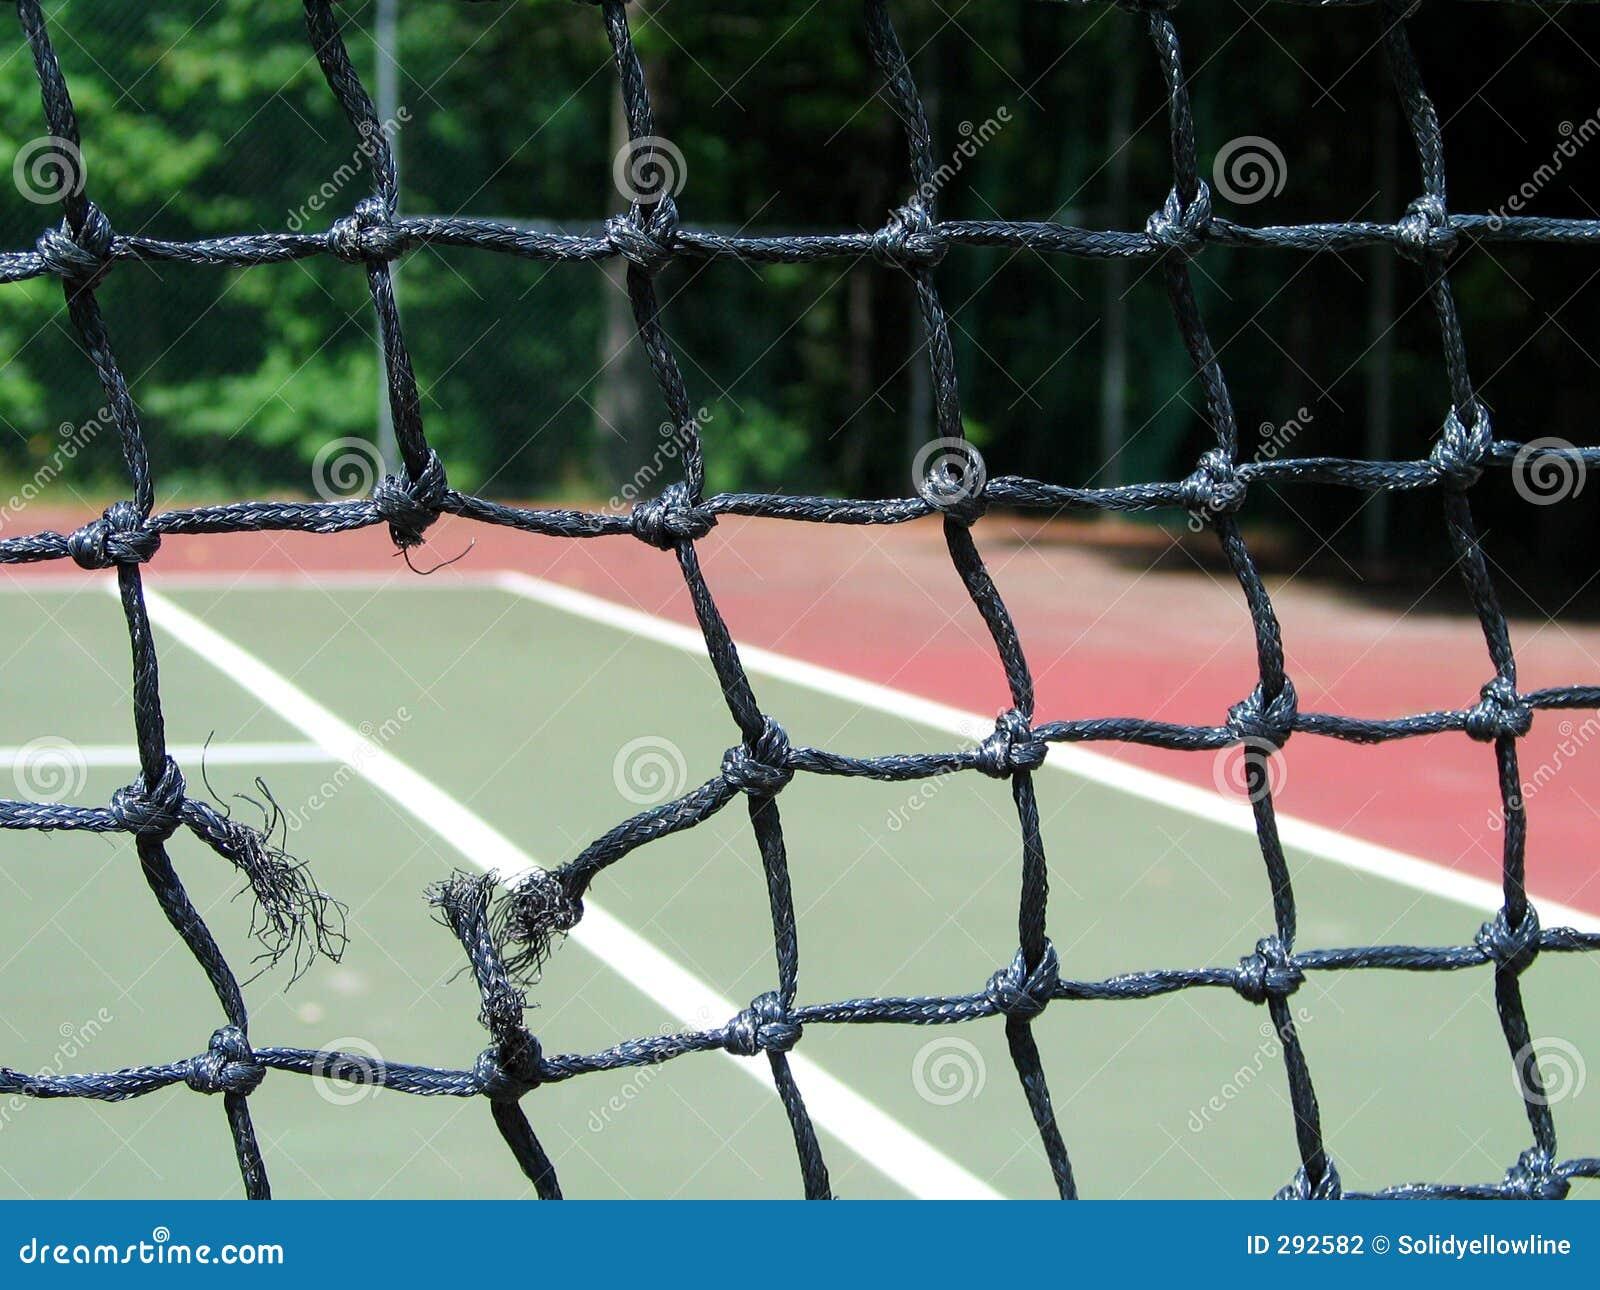 Extreem tennis